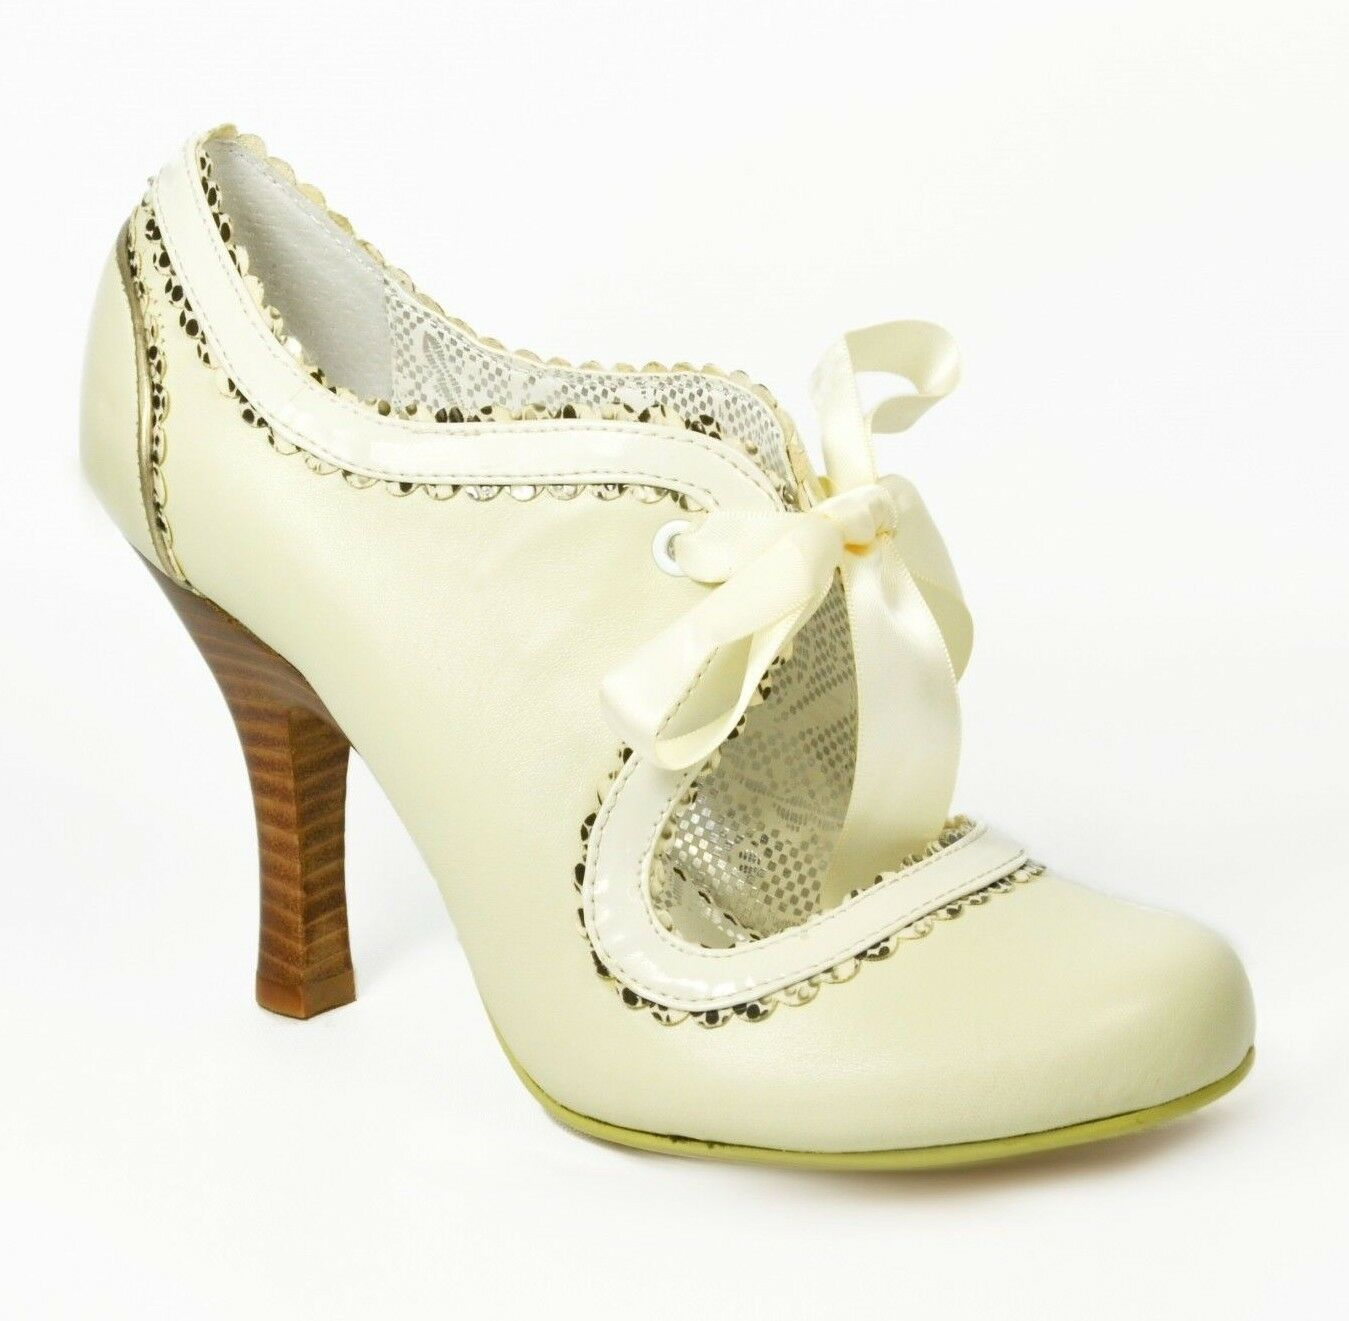 vendita calda online Poetic Licence scarpe scarpe scarpe Donna  Glamville Dress Pump Bone US Dimensione 6.5  prima qualità ai consumatori